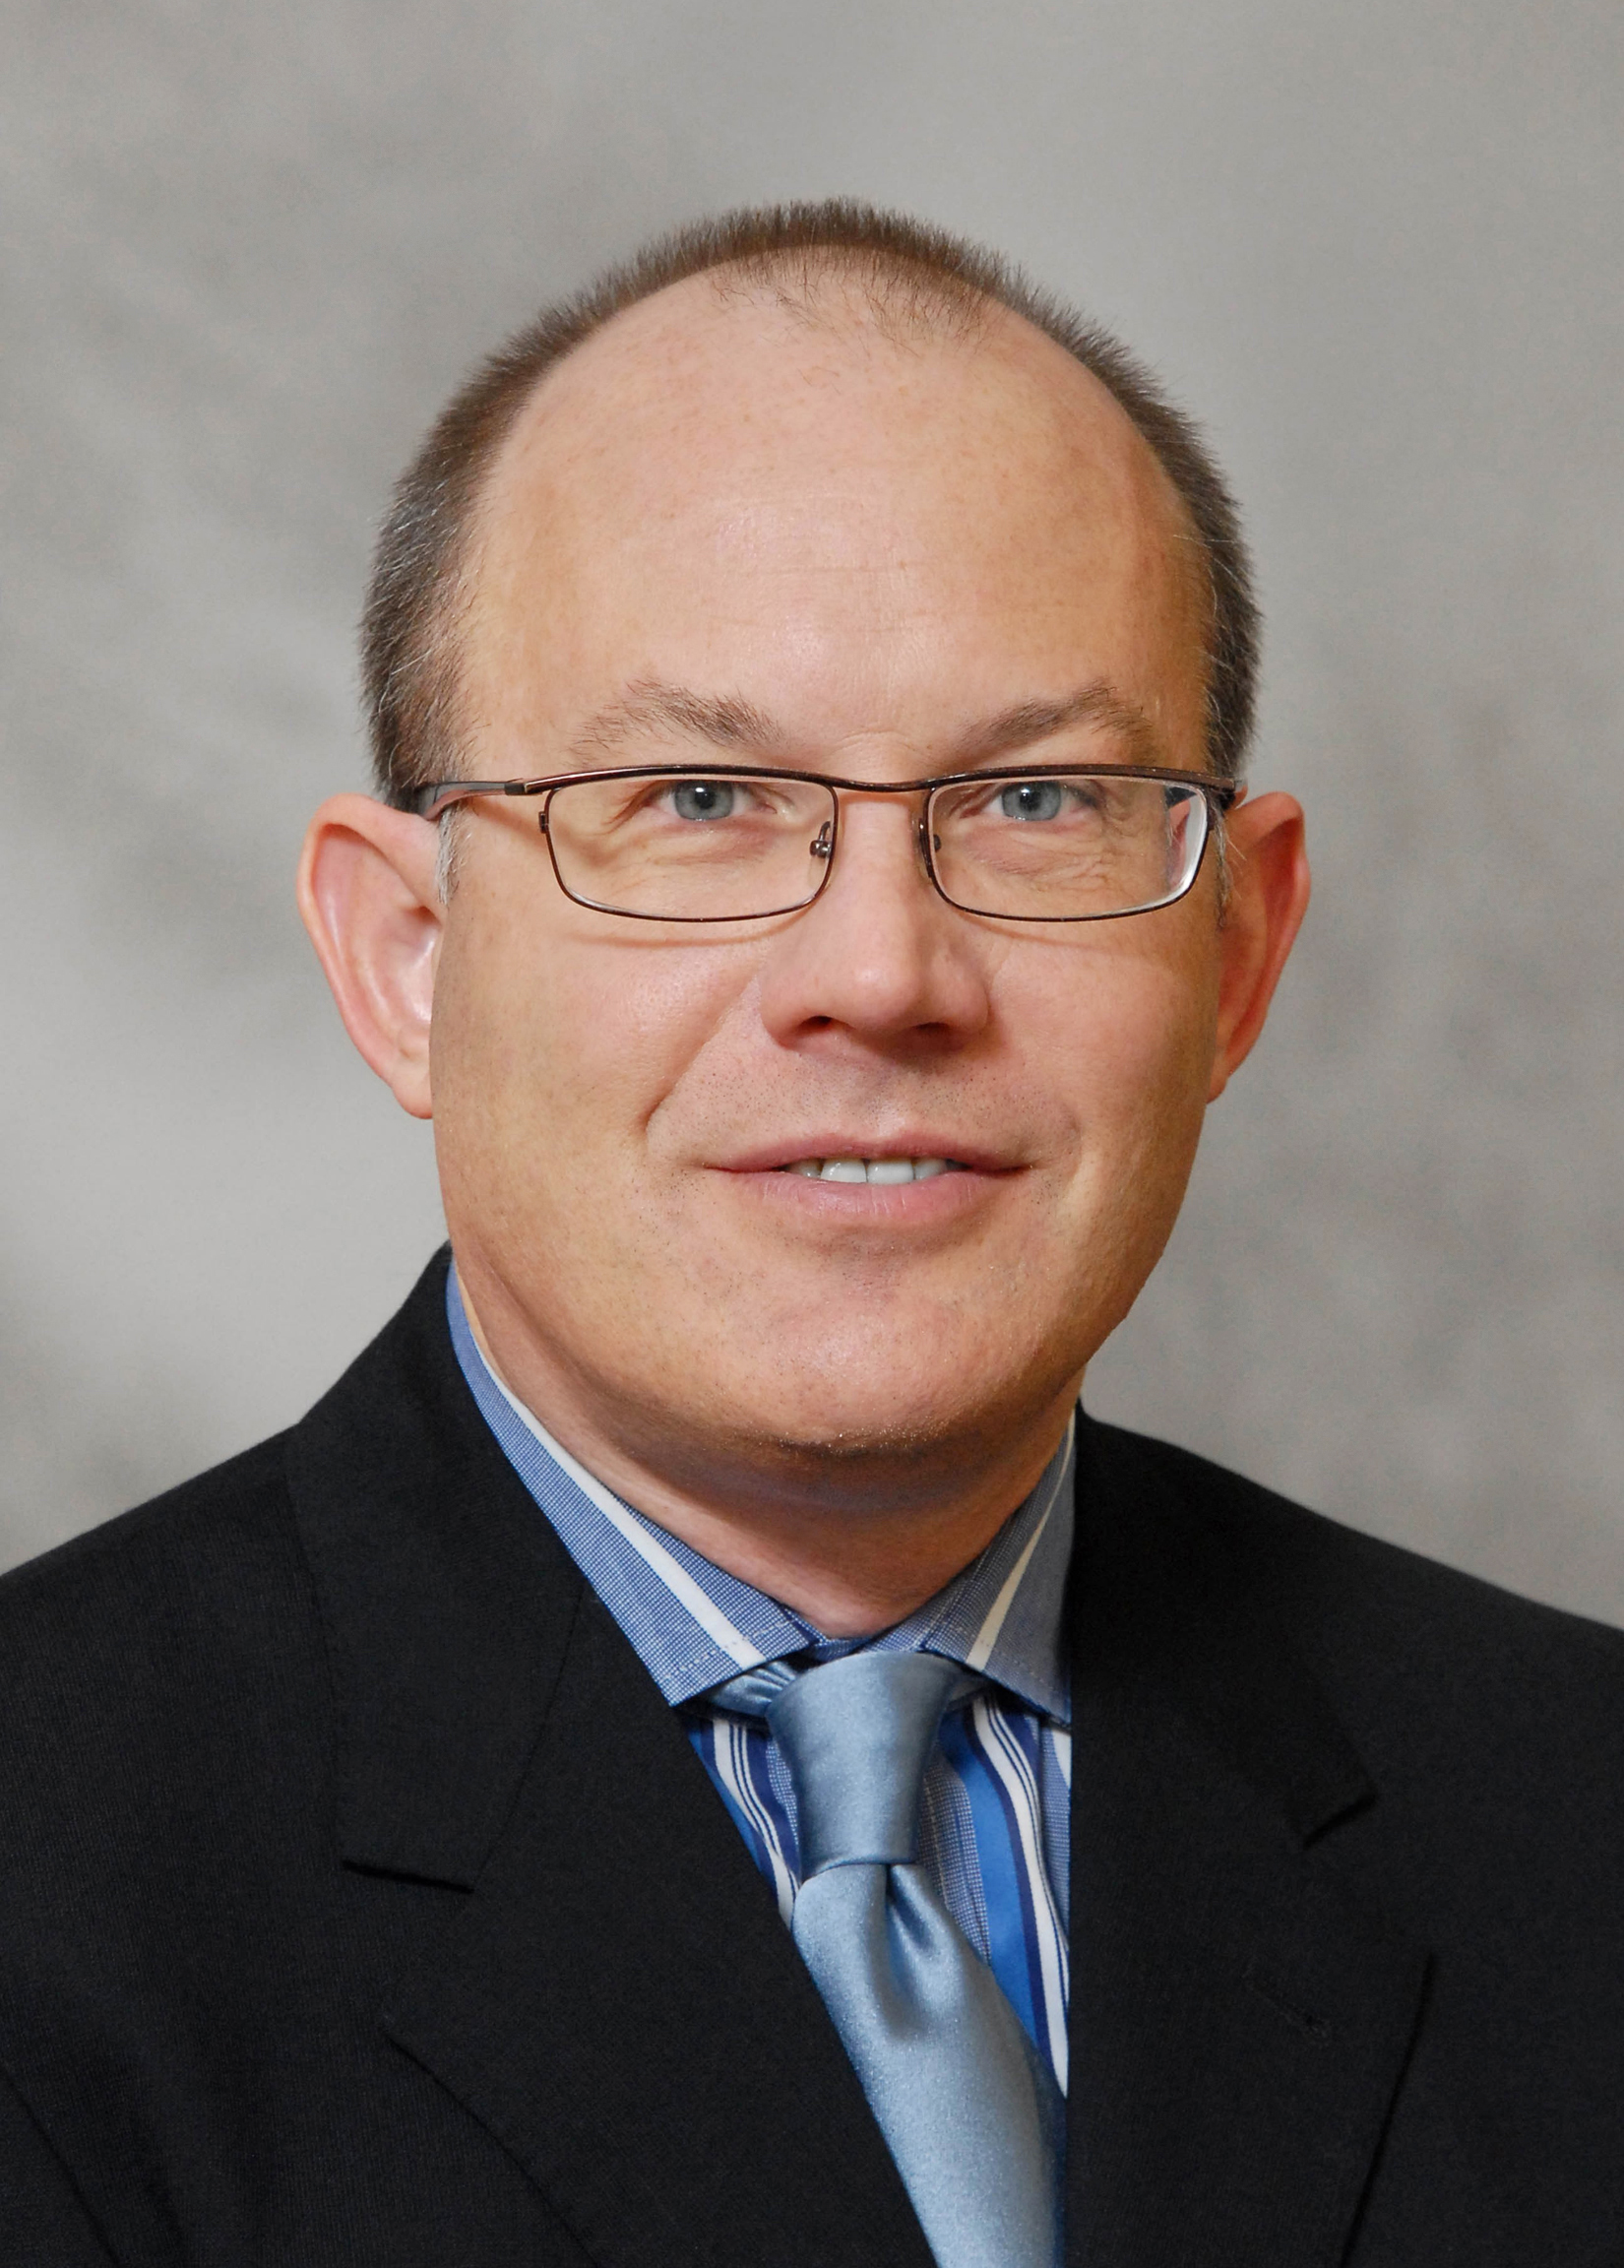 Phillip N. Rauk, MD